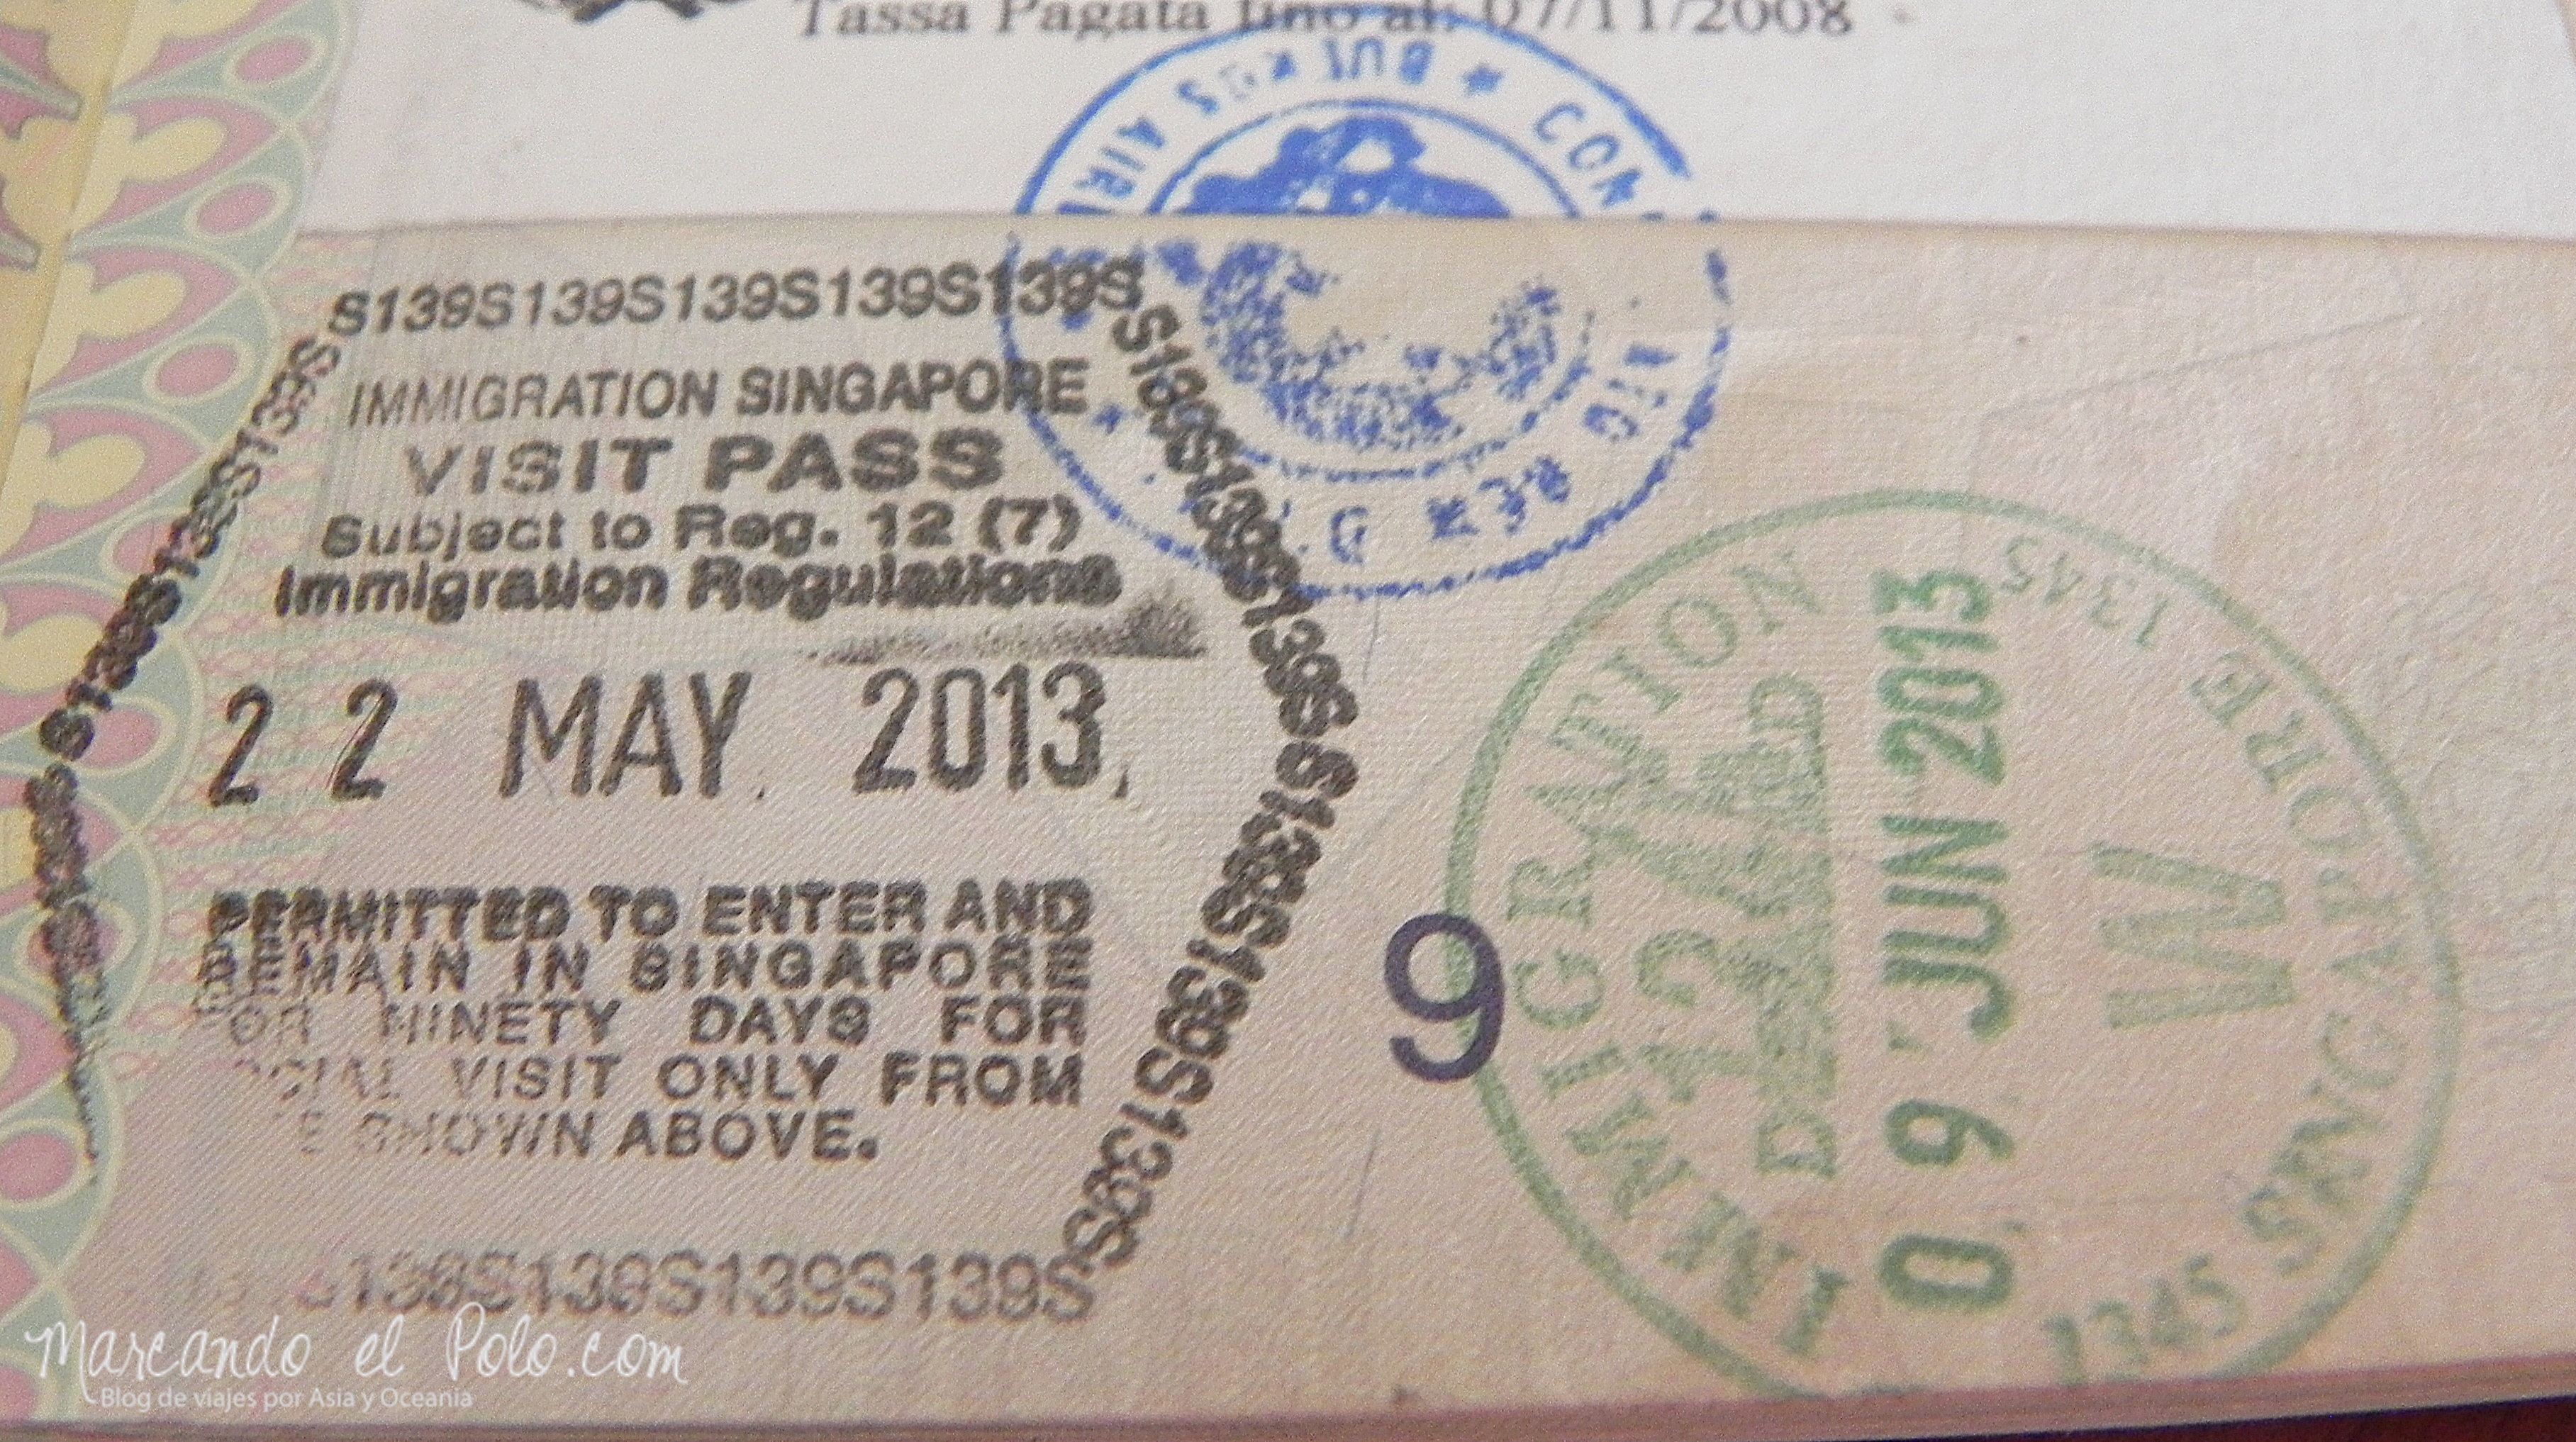 Viajar a Malasia y Singapur - Visa para Singapur